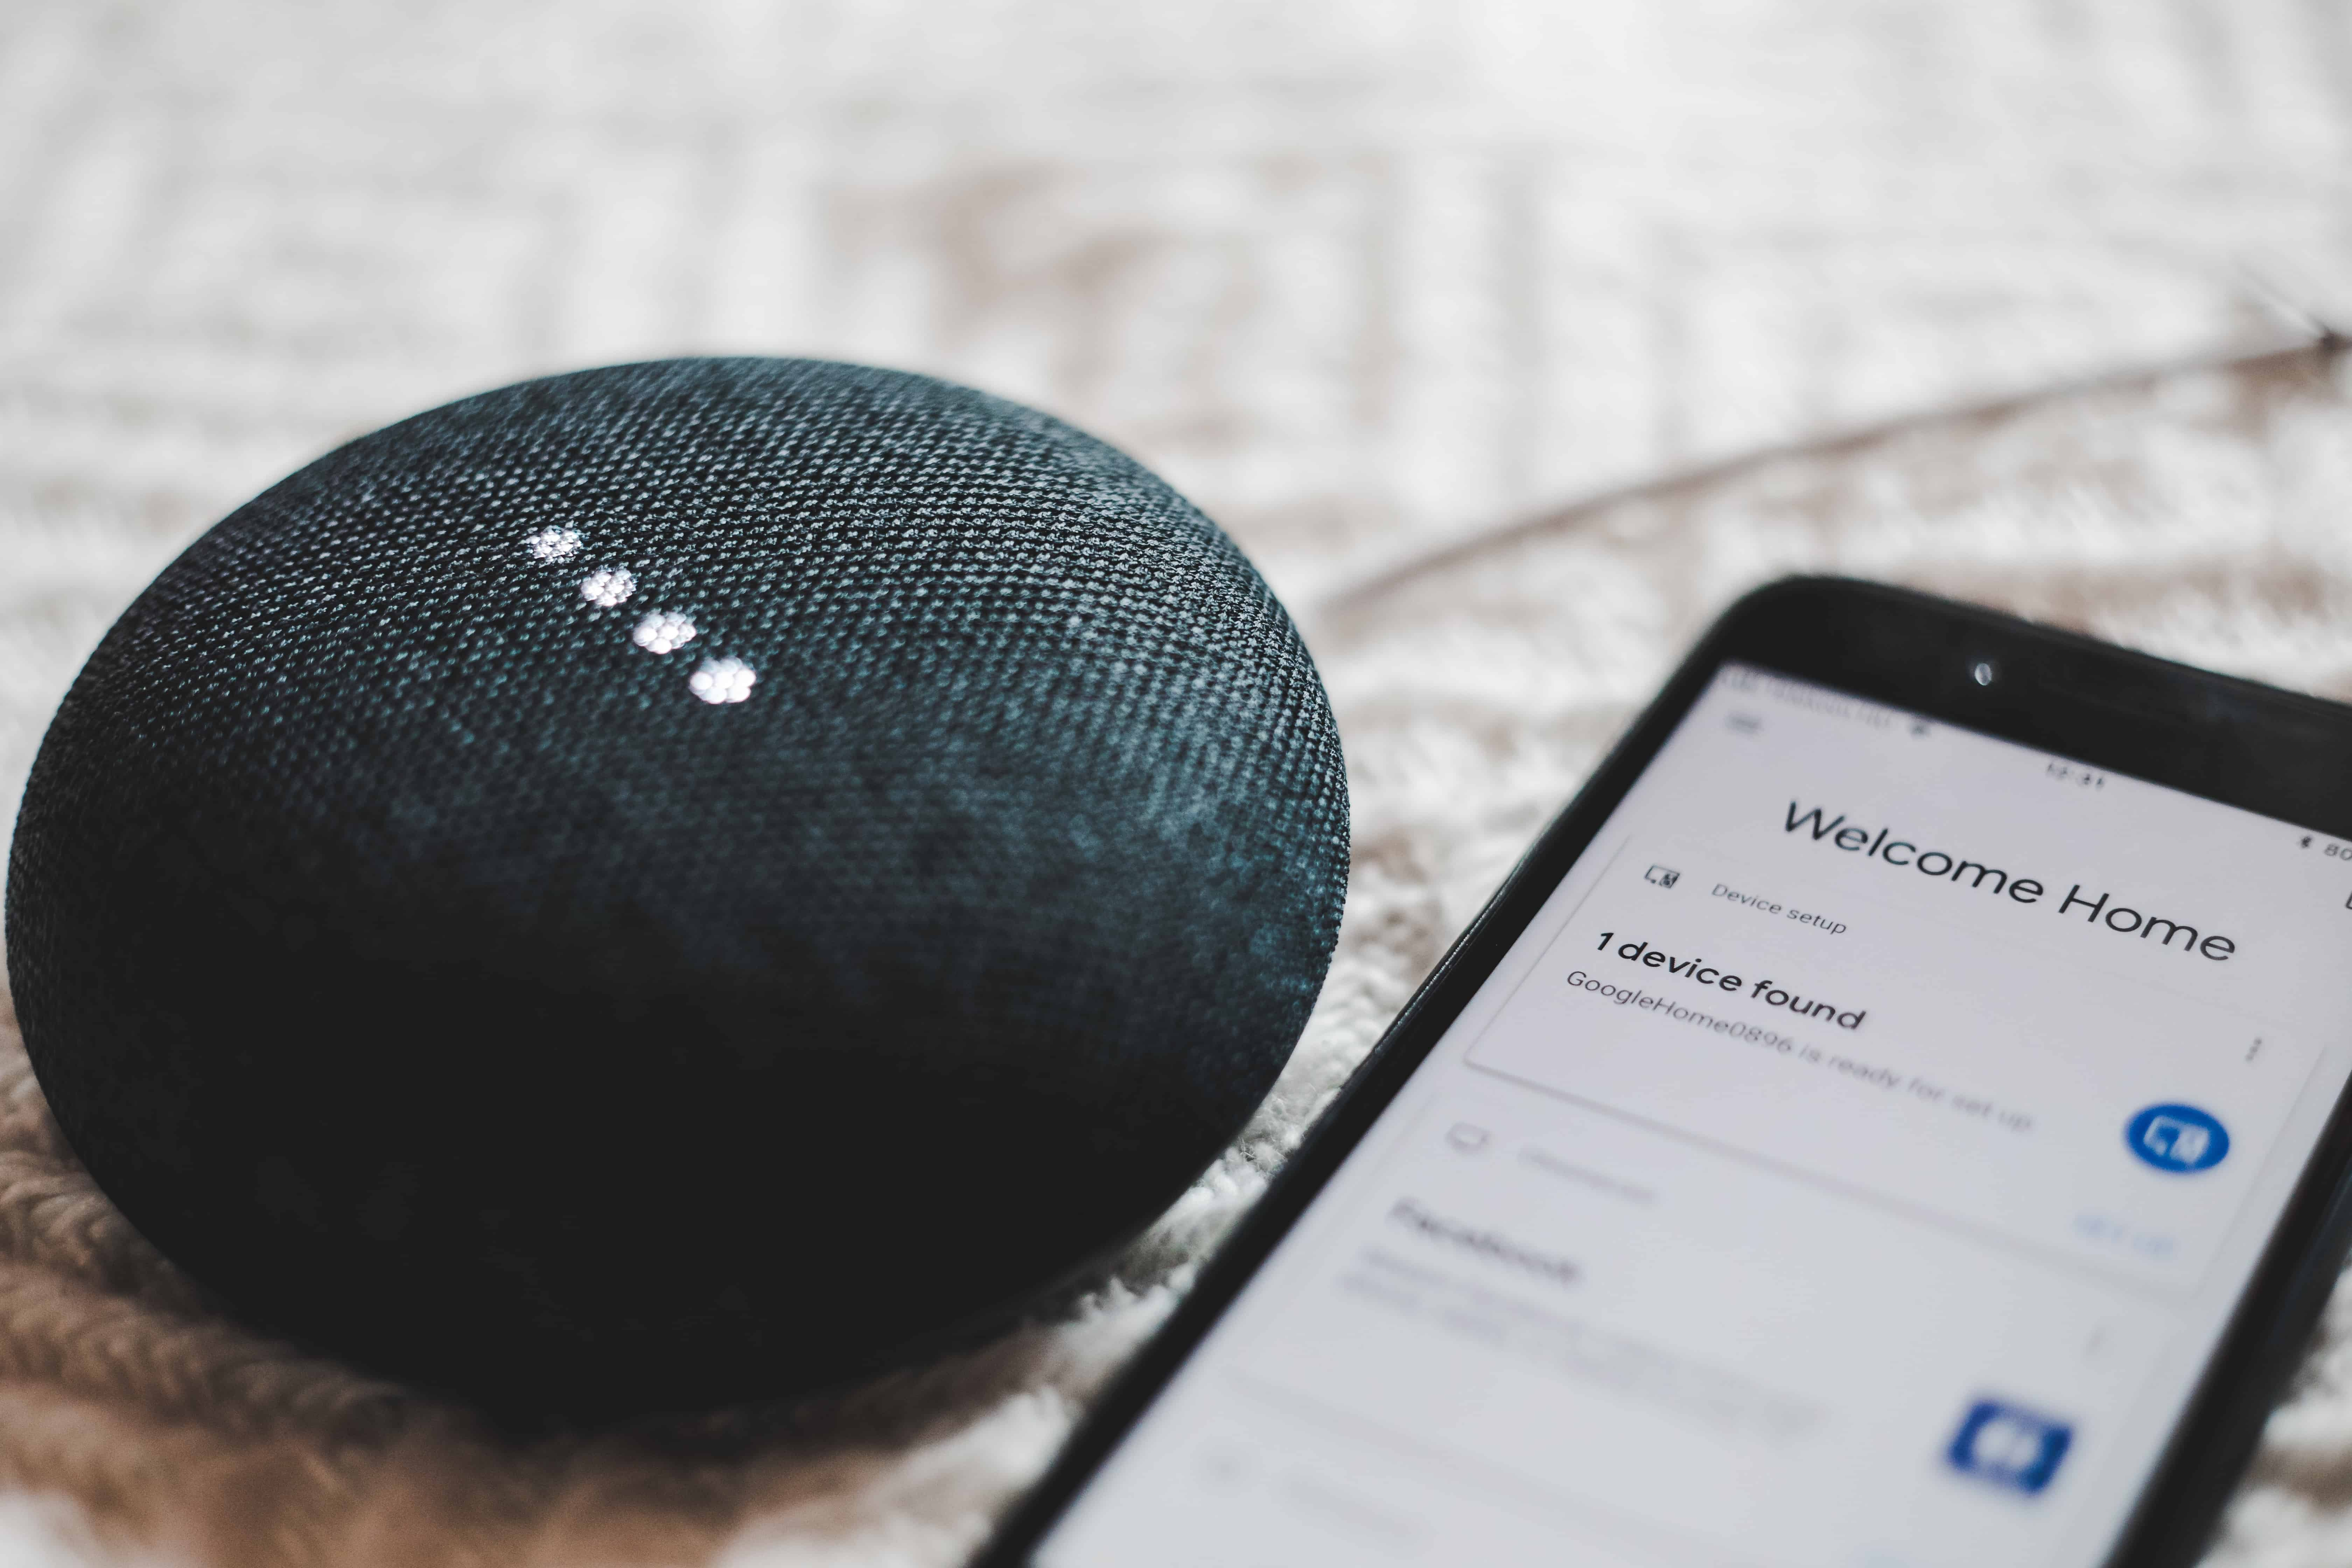 google home device beside smartphone